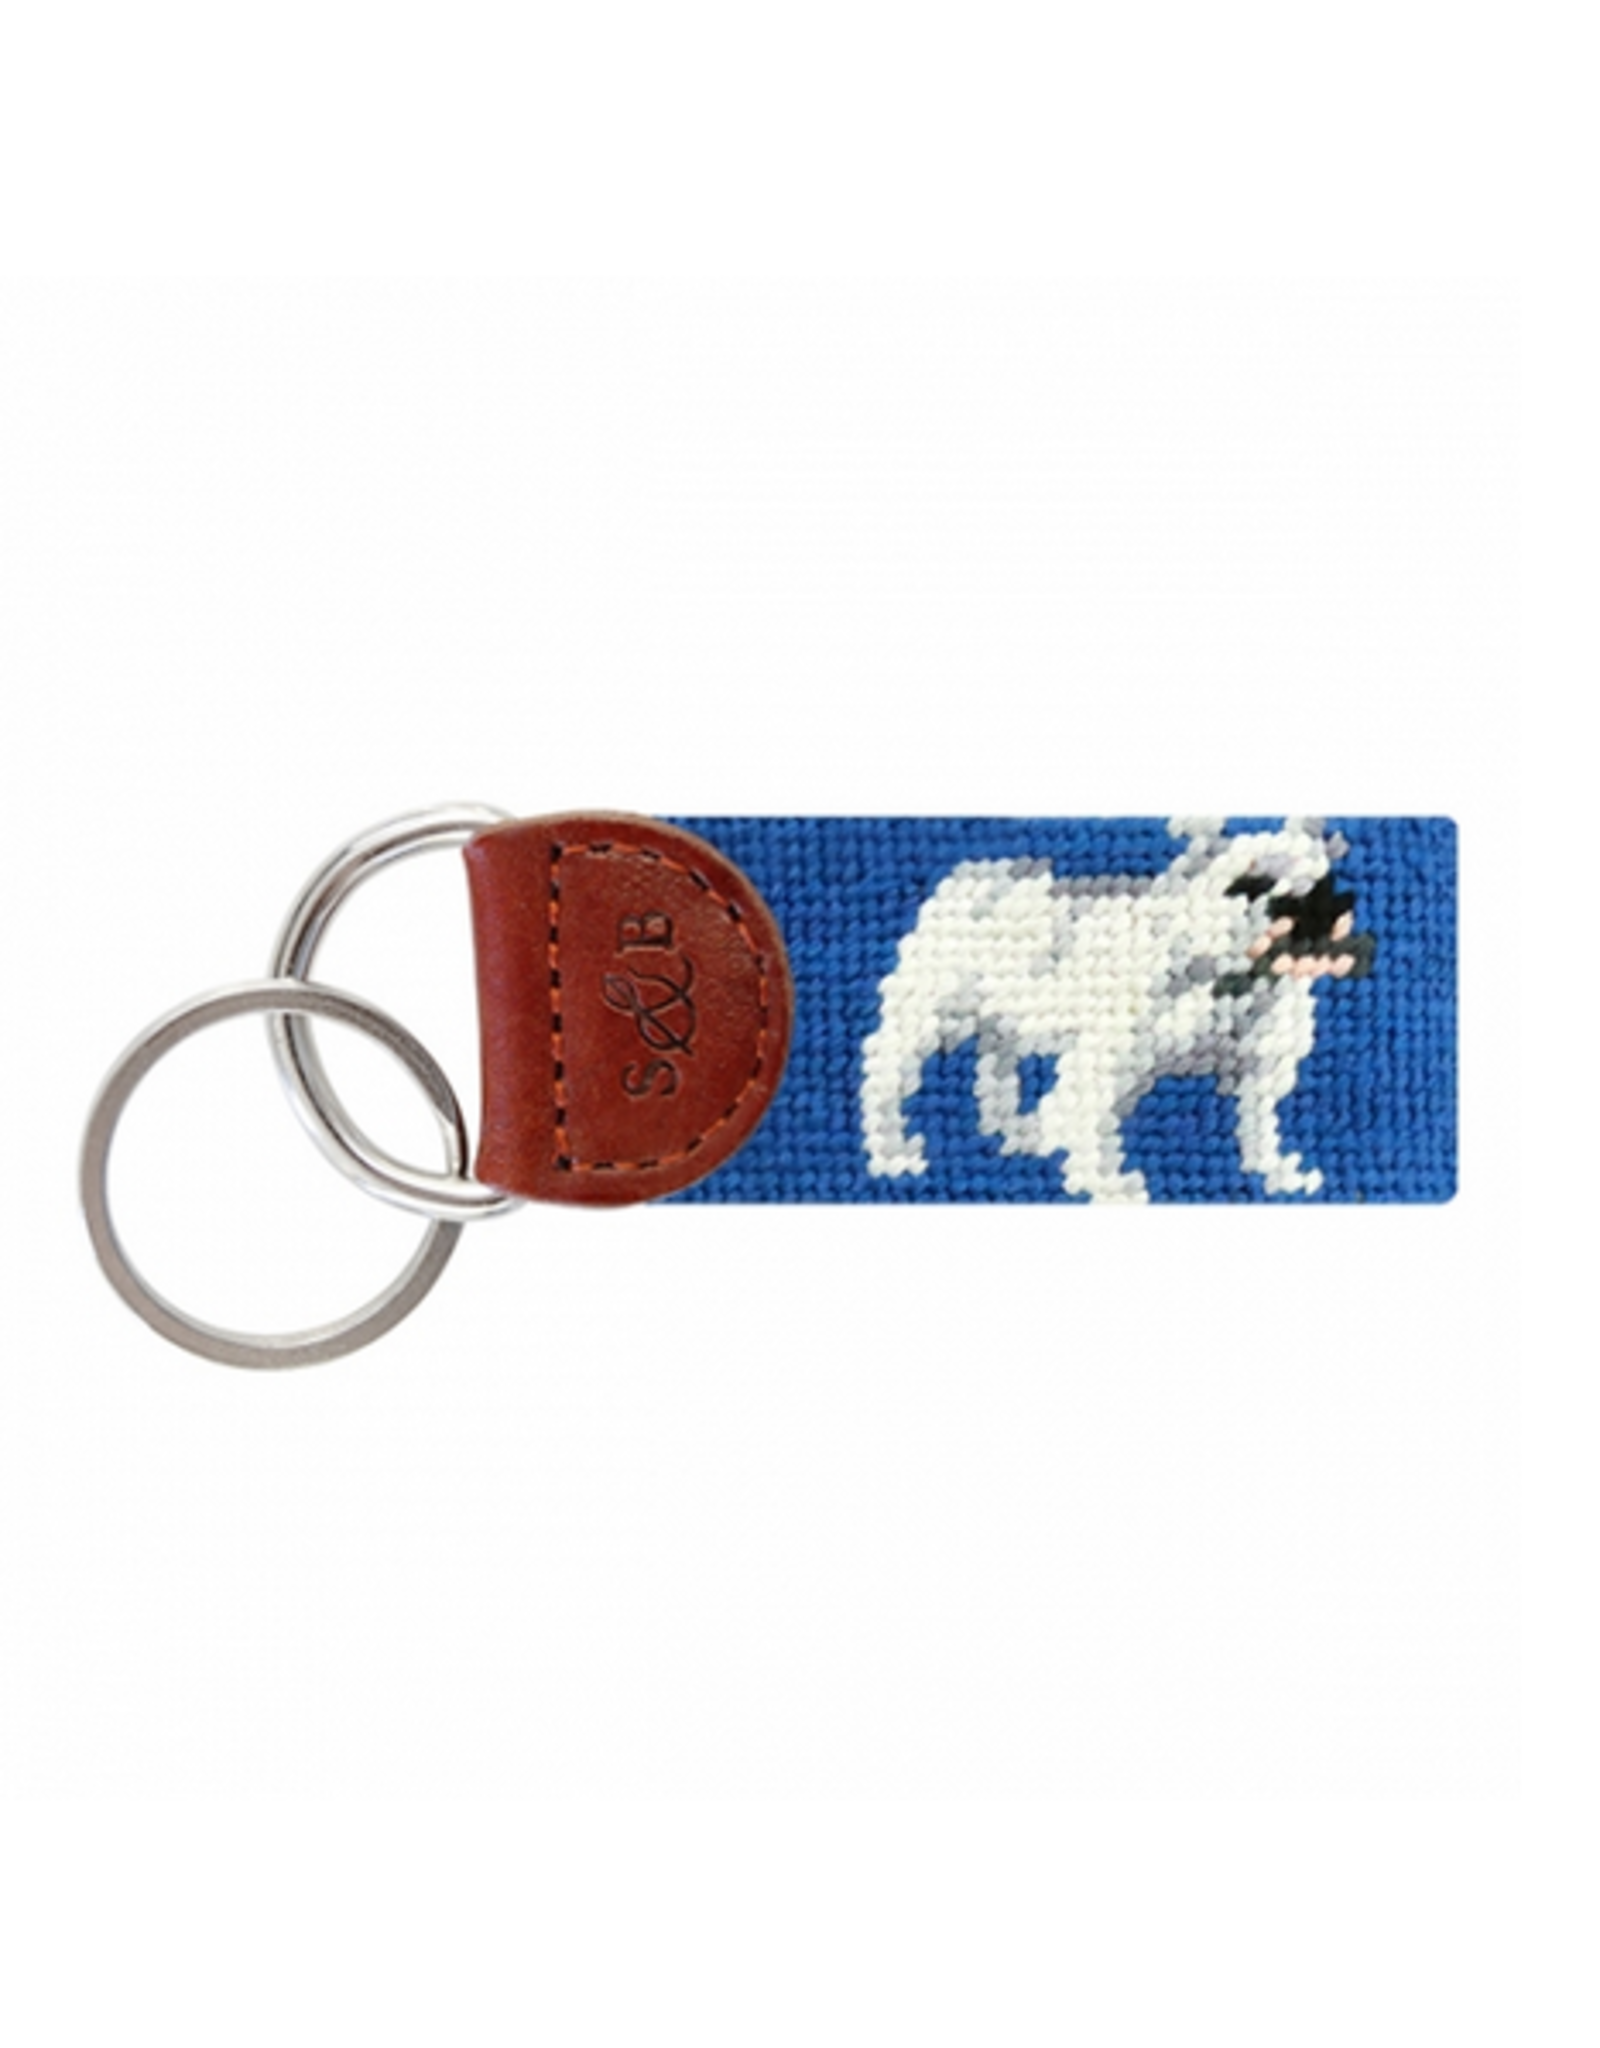 Smathers & Branson S&B Needlepoint Key Fob, Bulldog